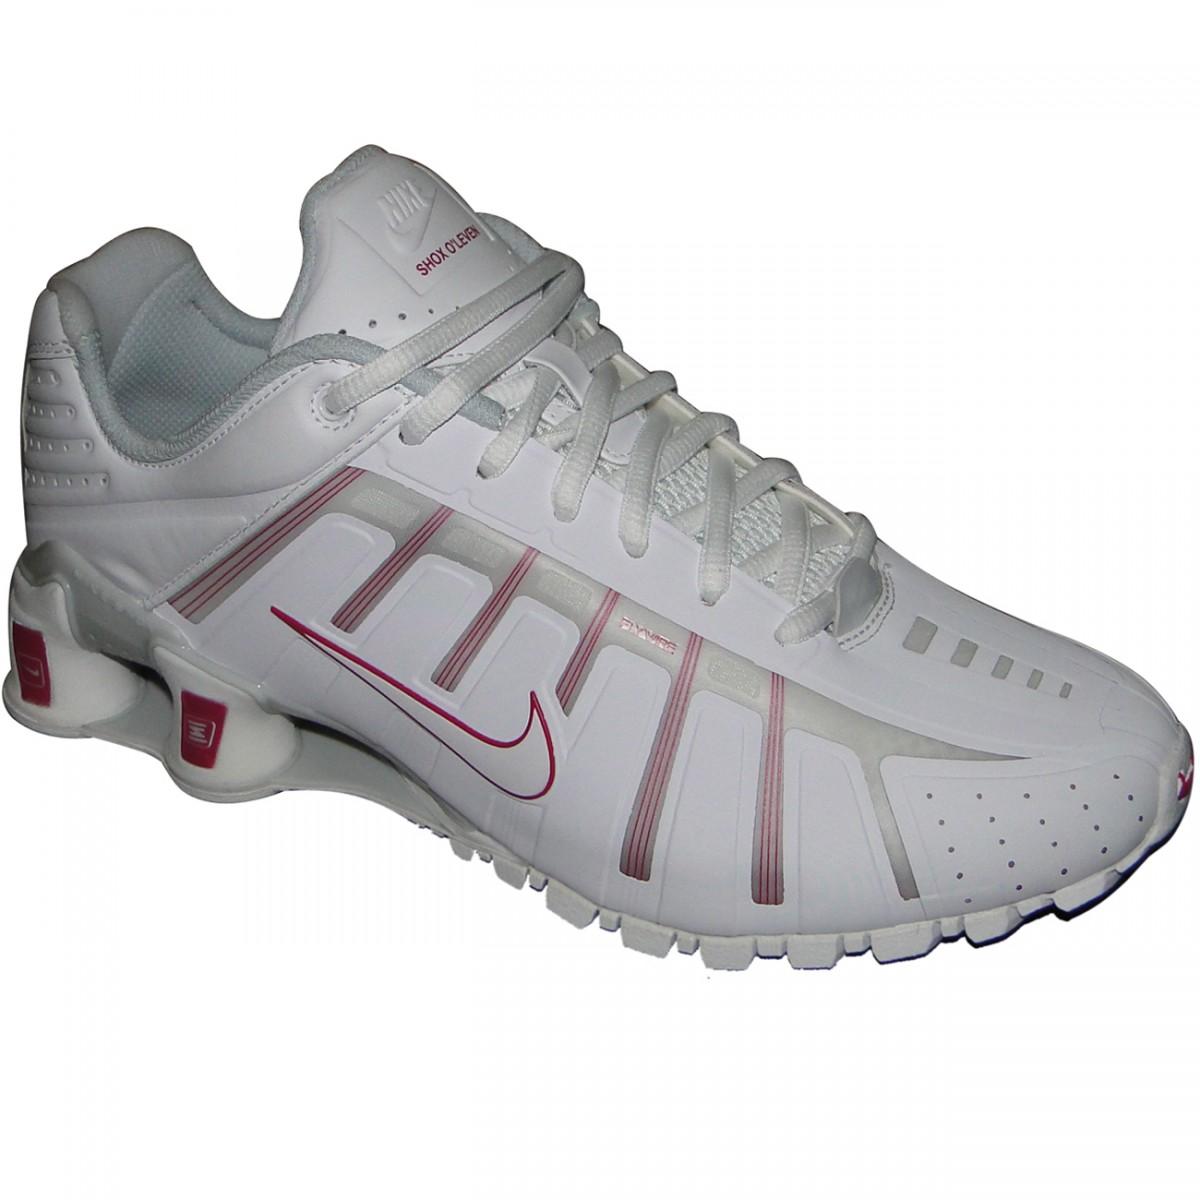 premium selection d526a 1302b Tênis Nike Shox O leven 429868105 - BRANCO LILAS - Chuteira Nike, Adidas.  Sandalias Femininas. Sandy Calçados